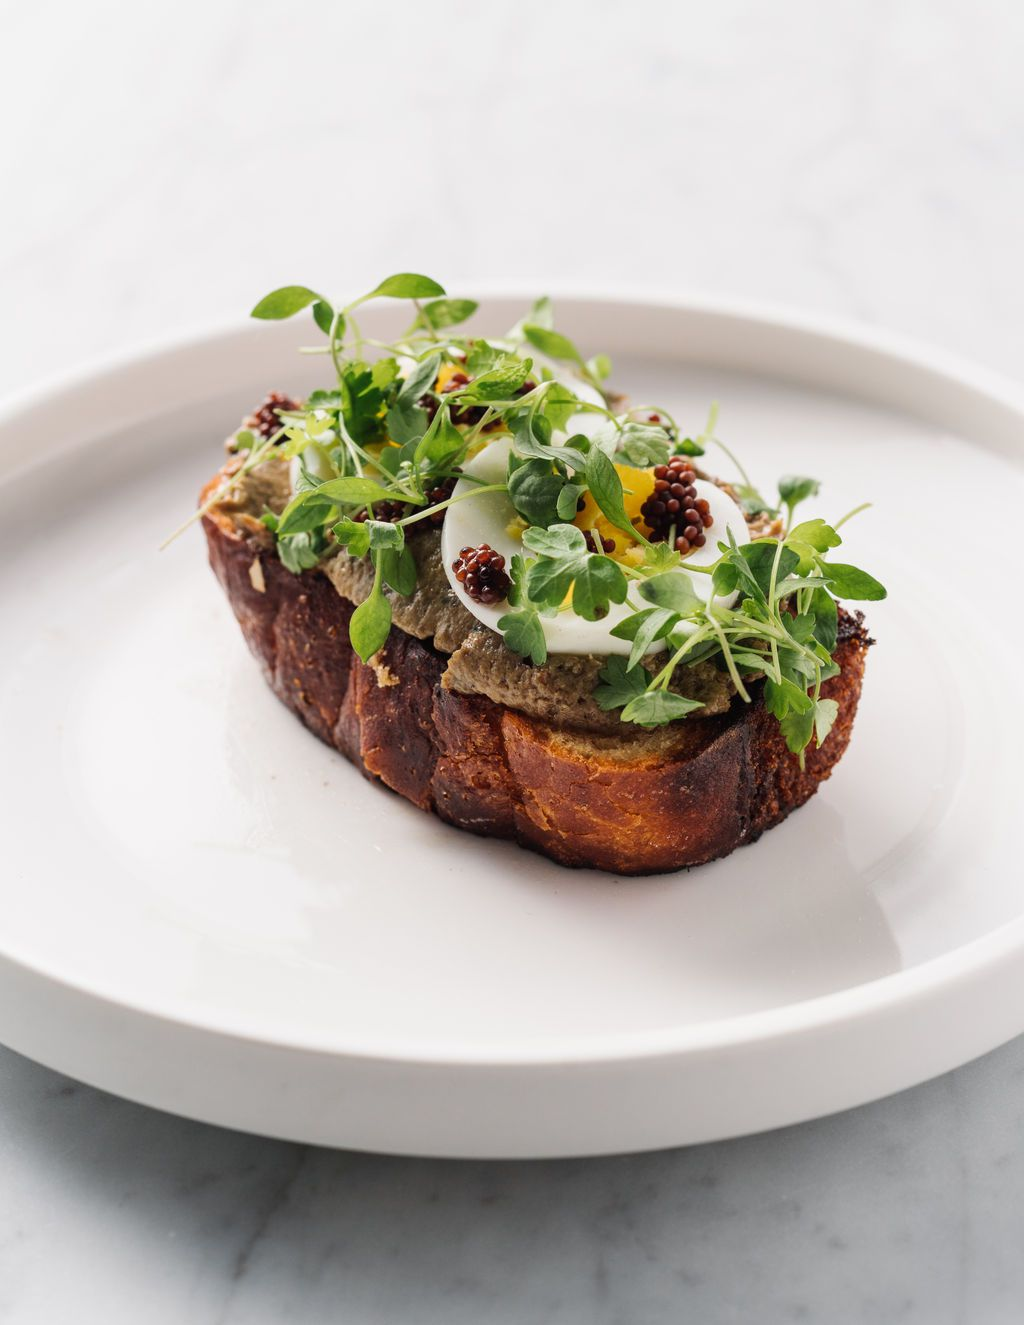 Chicken liver tartine at Tin Tin